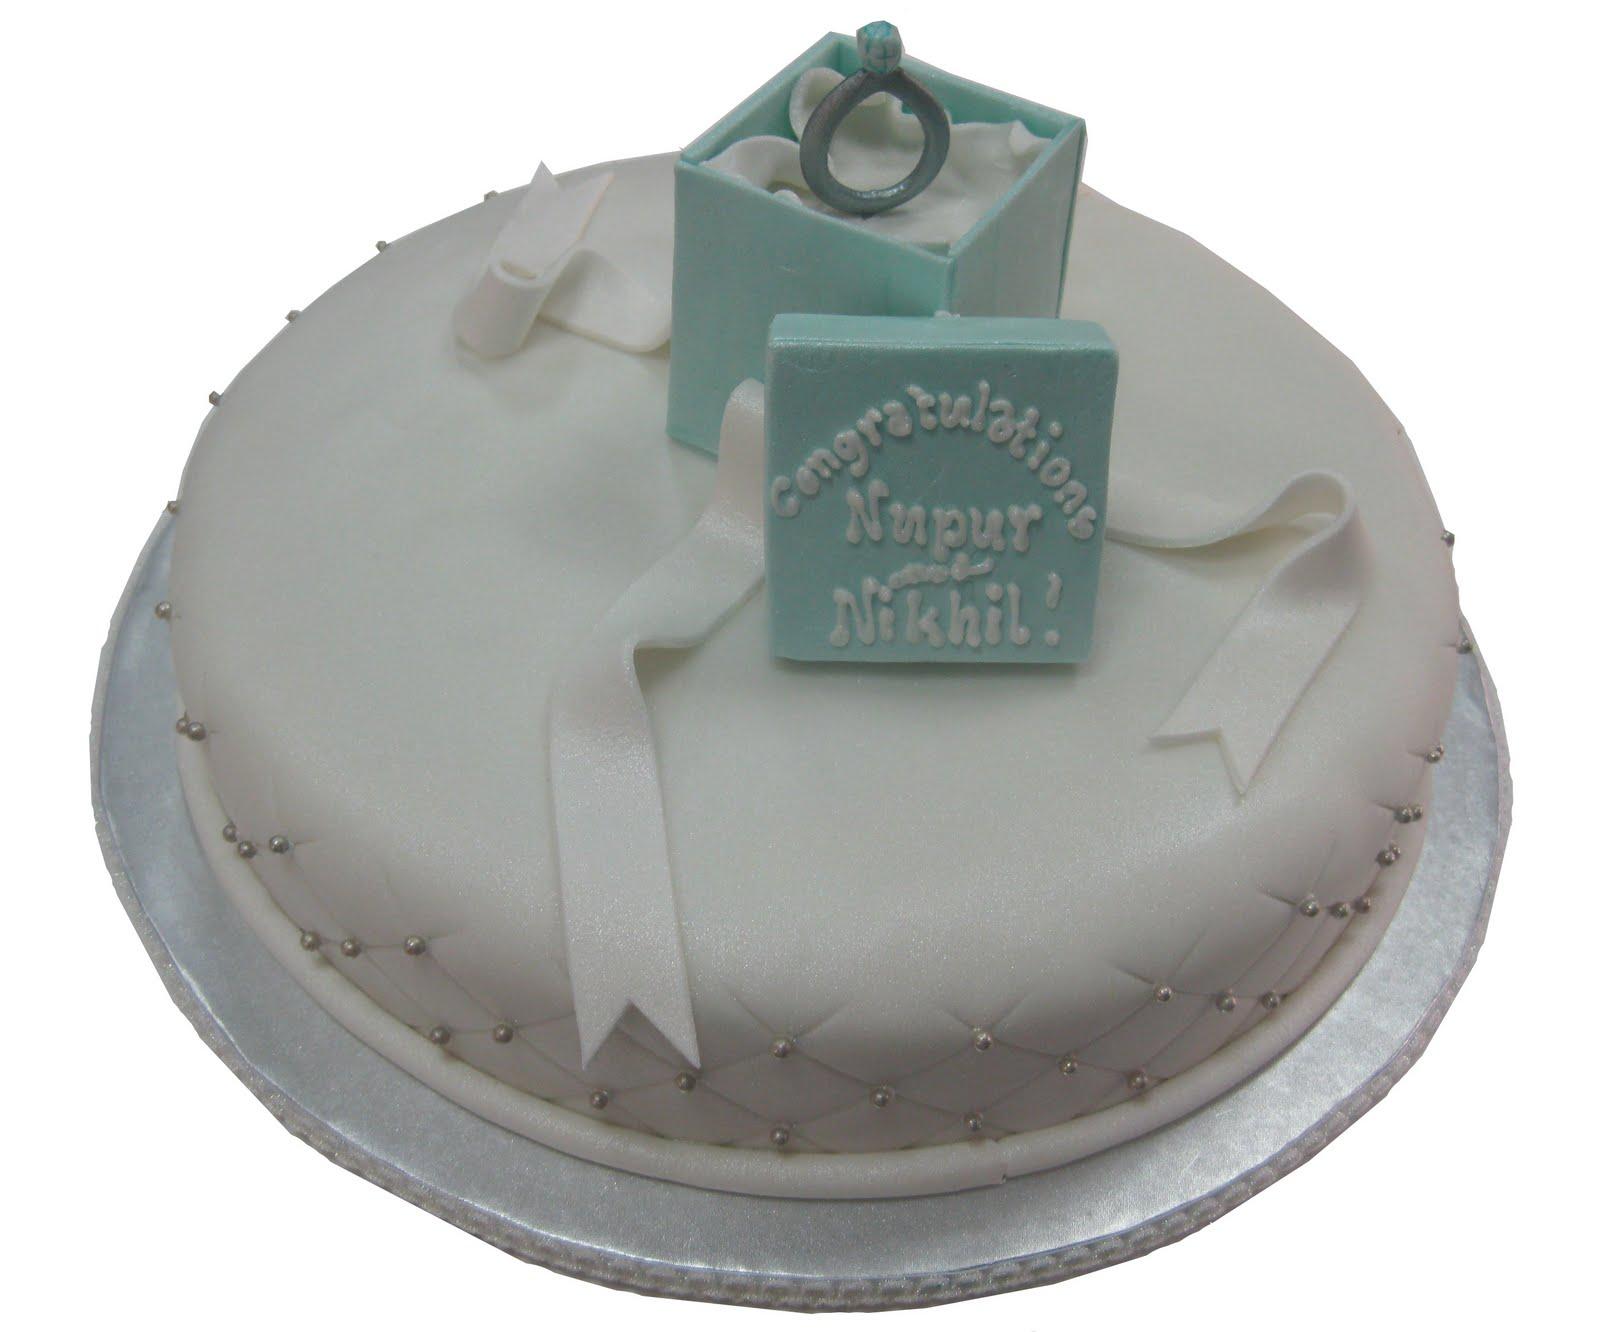 Birthday Cakes Dubai ~ Sweet lane cake shop in dubai birthday cakes cupcakes in dubai